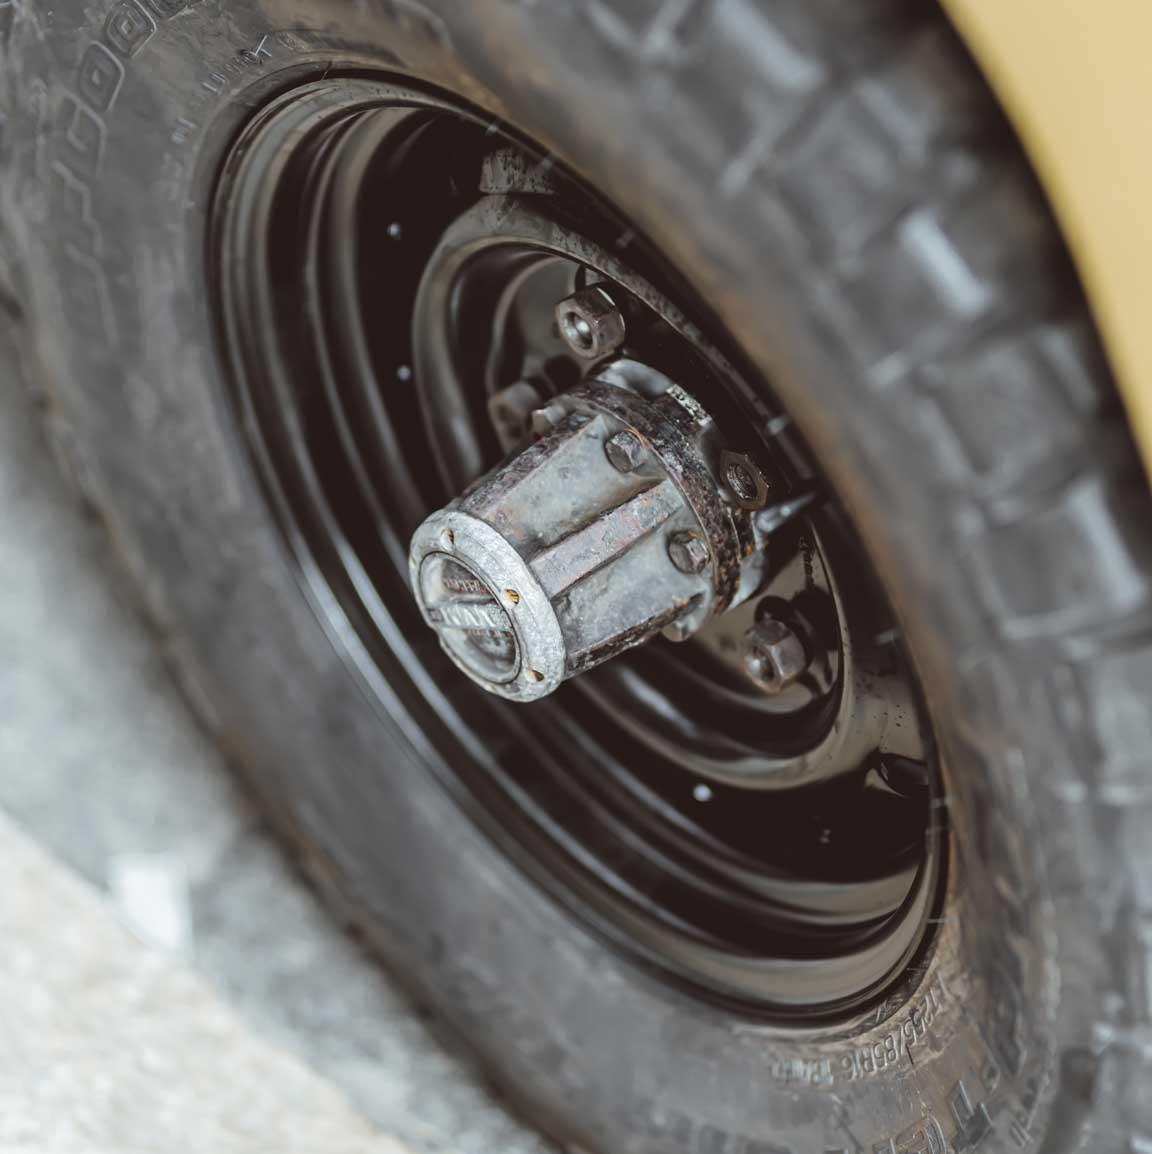 1975_Land_Rover_Series_III_109_Bahama_Gold_Small_0013_Layer 57.jpg